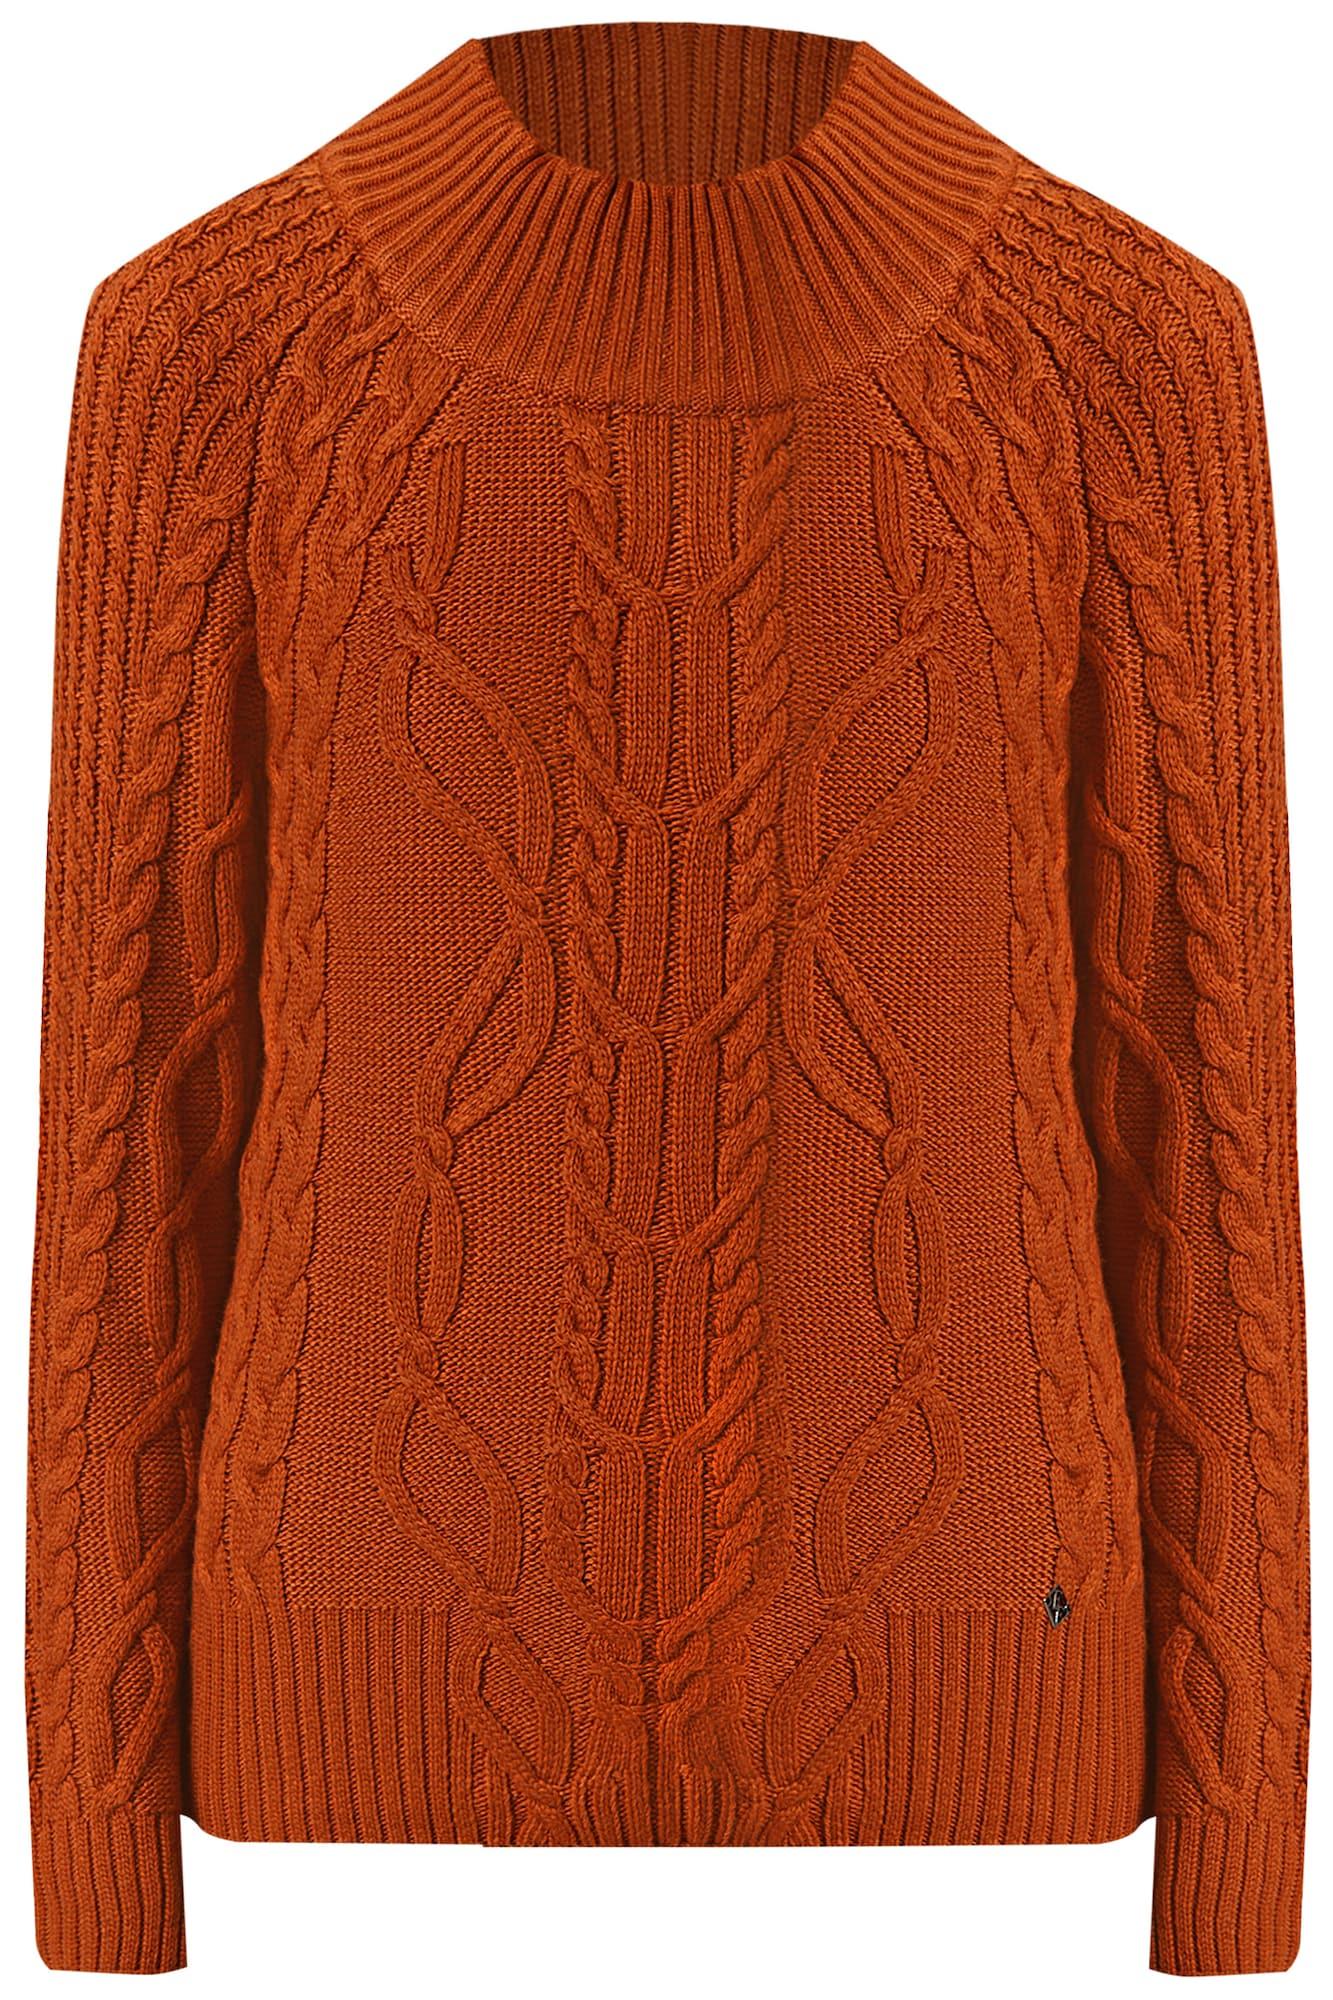 Pullover | Bekleidung > Pullover > Sonstige Pullover | Finn Flare